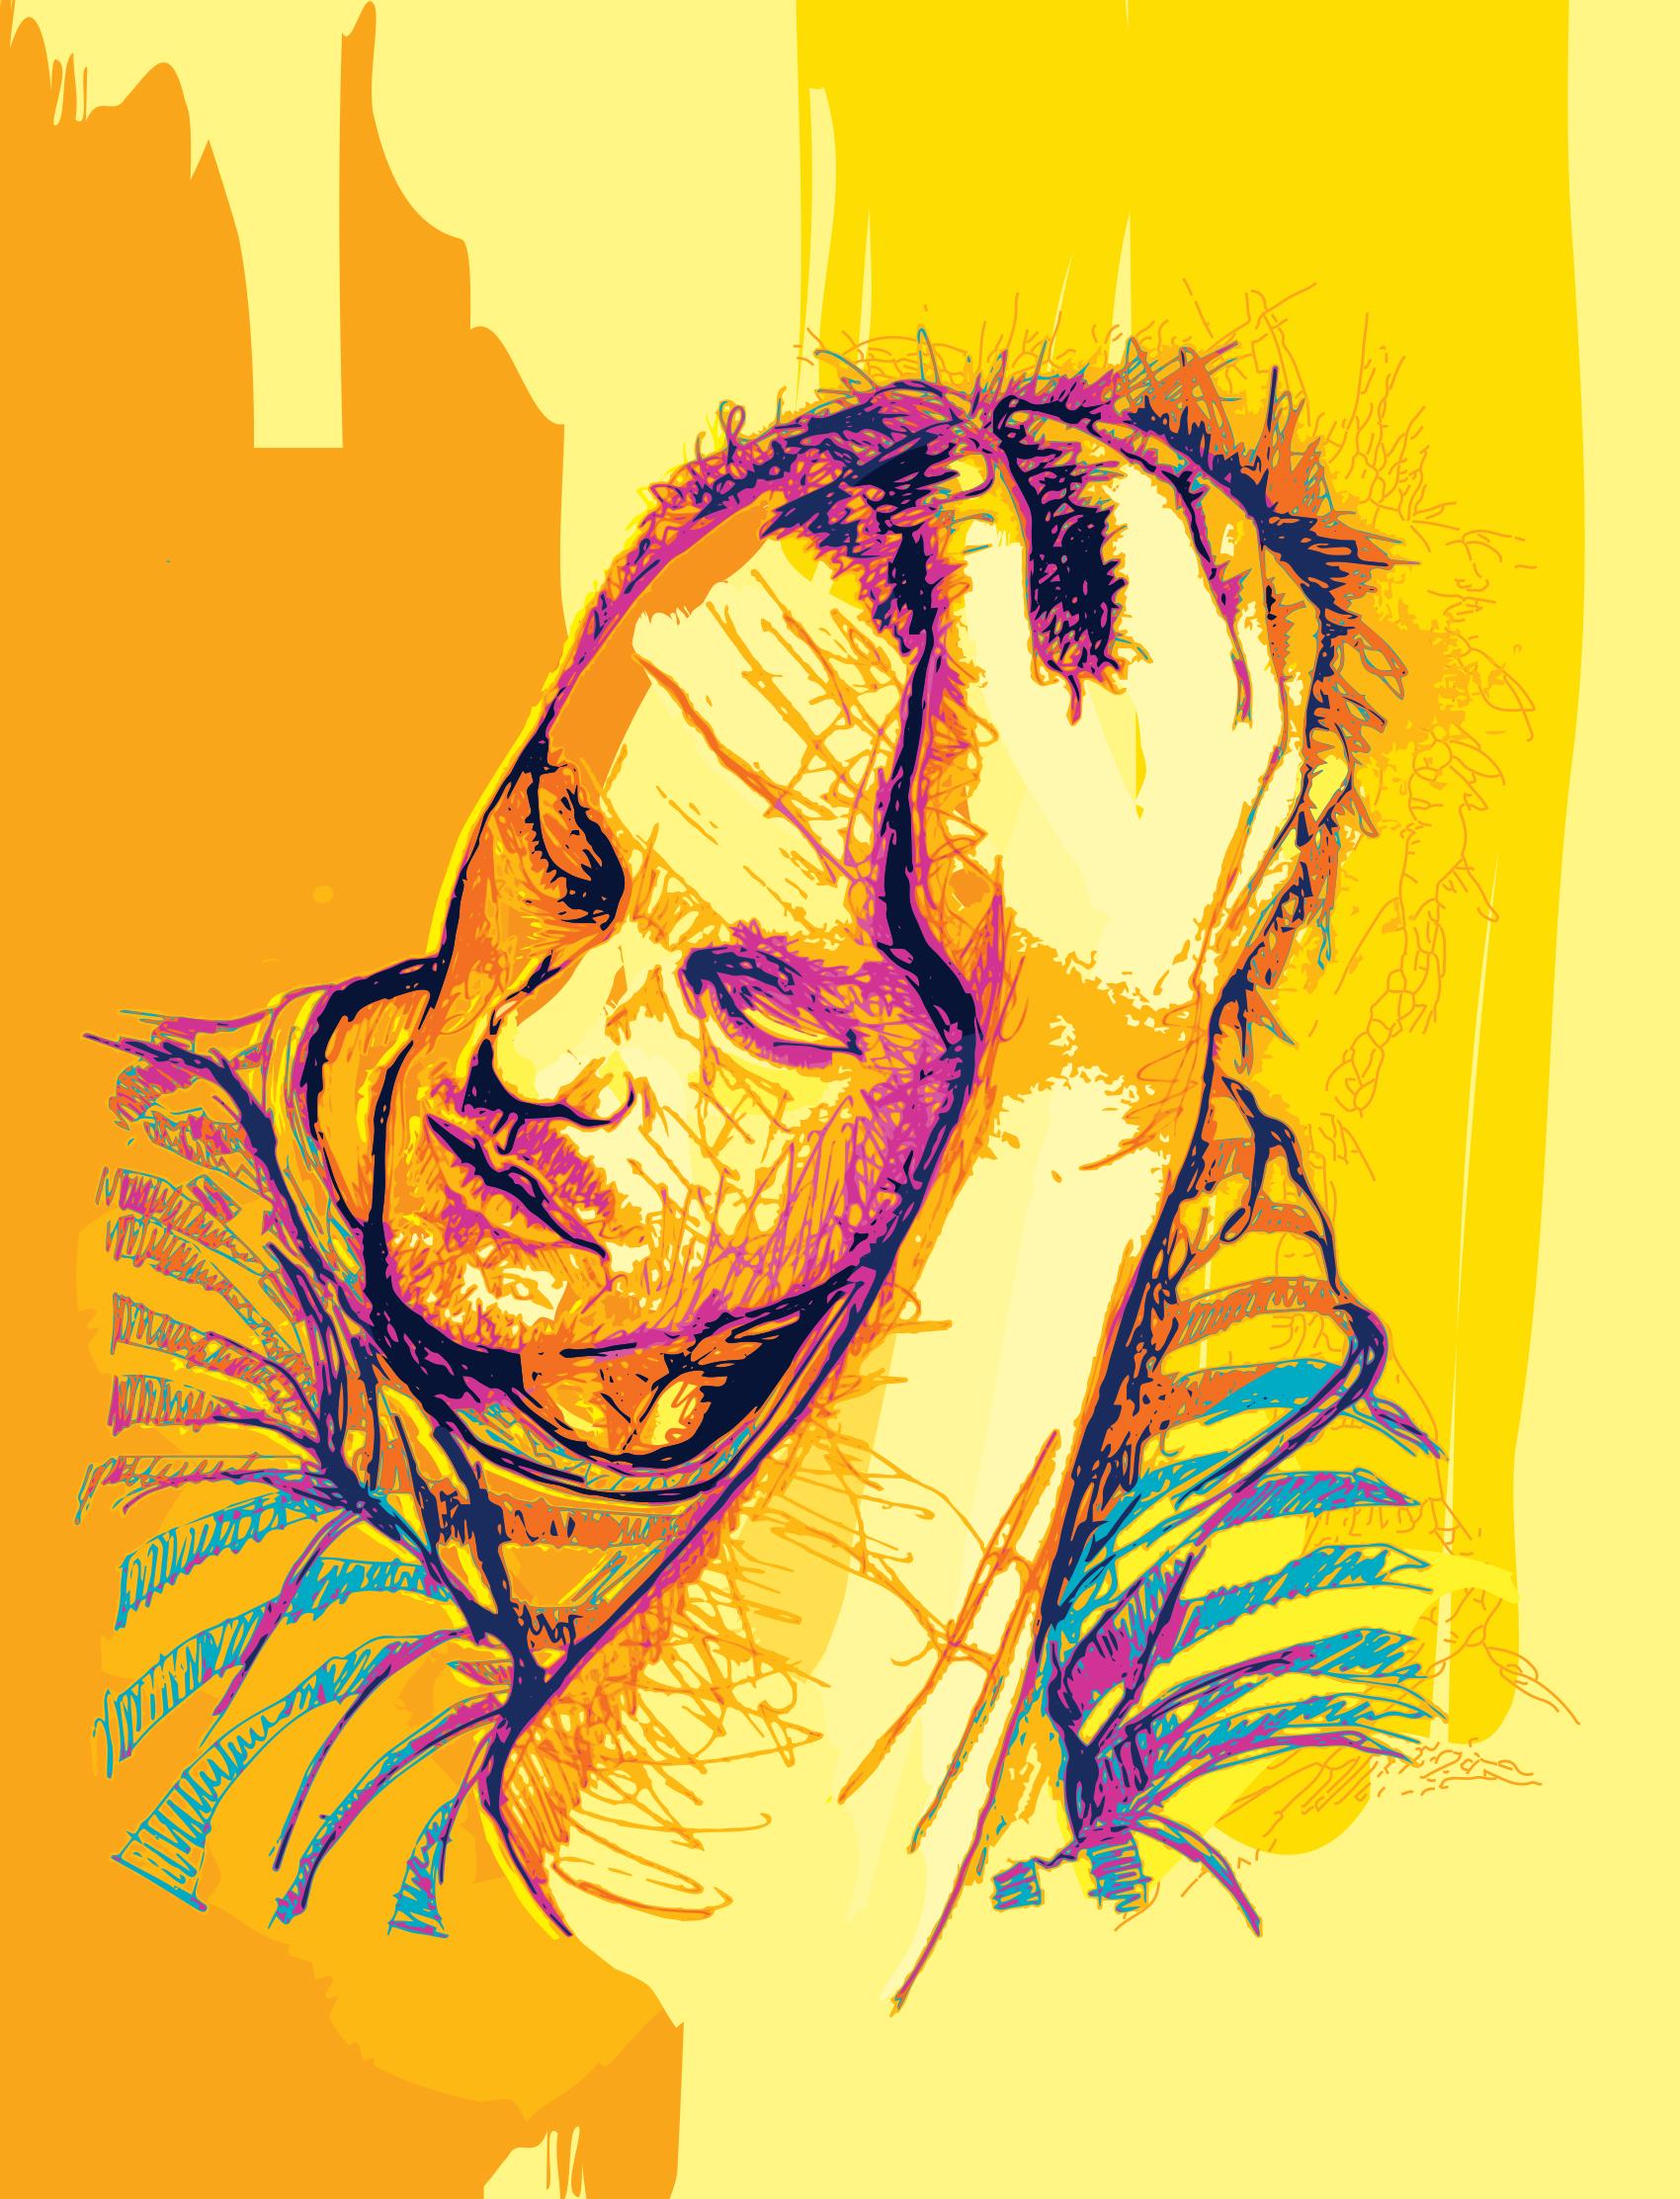 digital-drawing-28-celebrity-heath-ledger.jpg